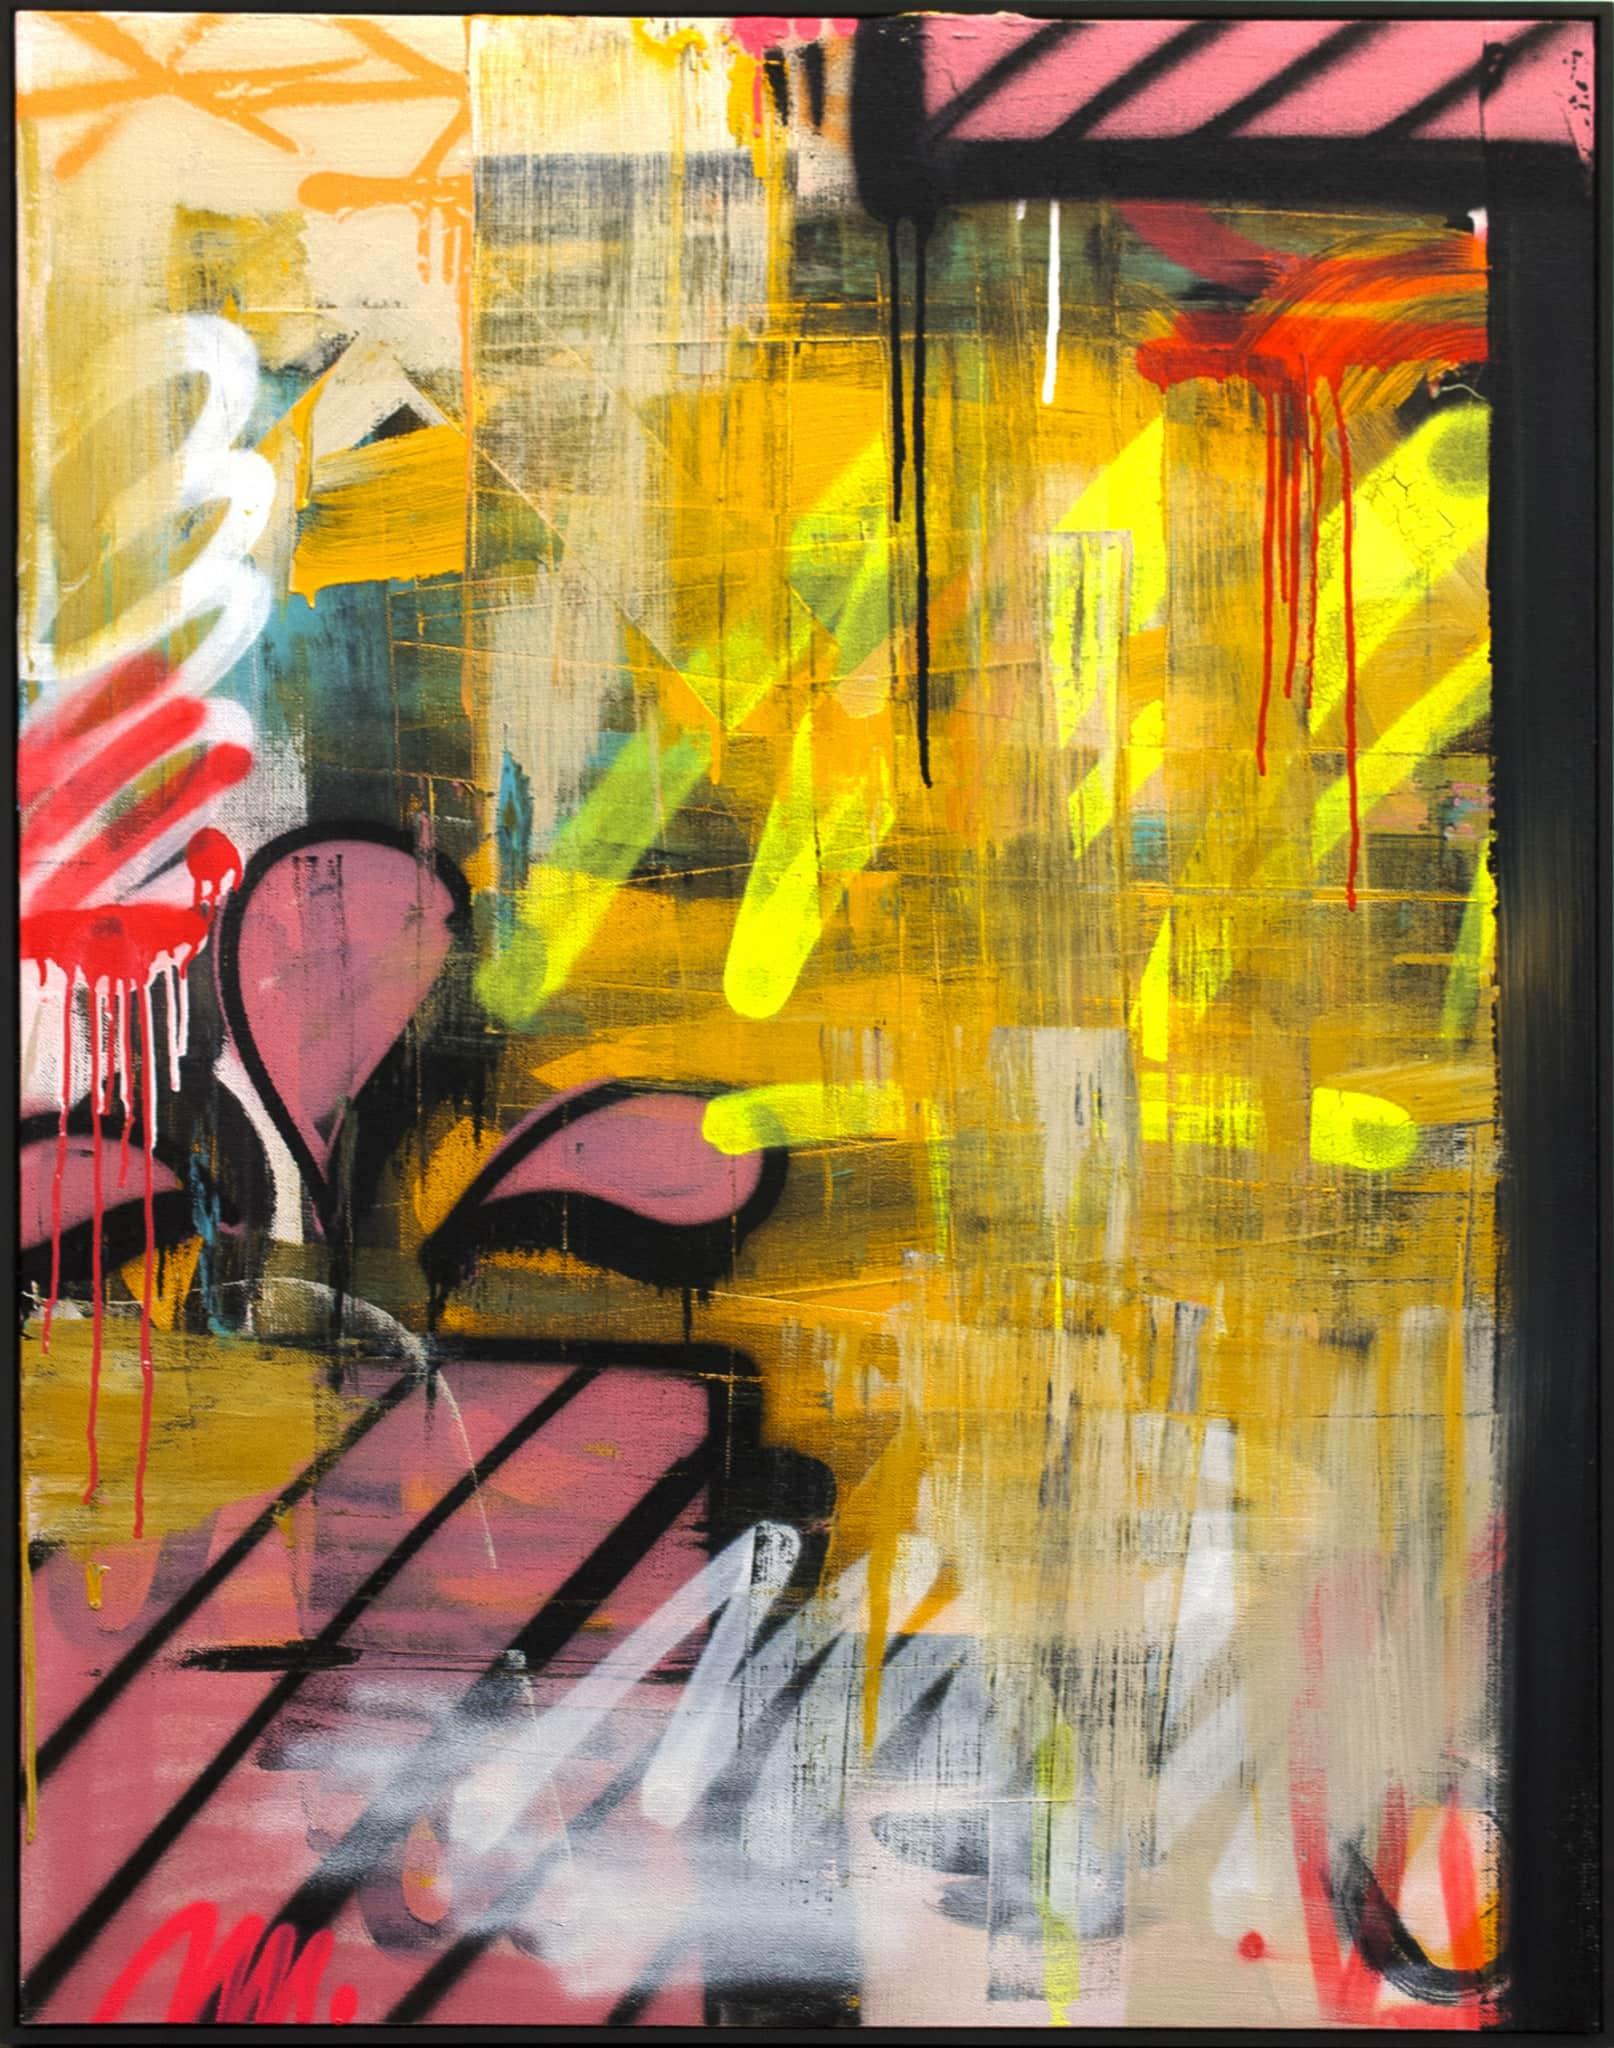 accueil galerie art jingle street art paris marais place des vosges, Galerie Art Jingle – Accueil